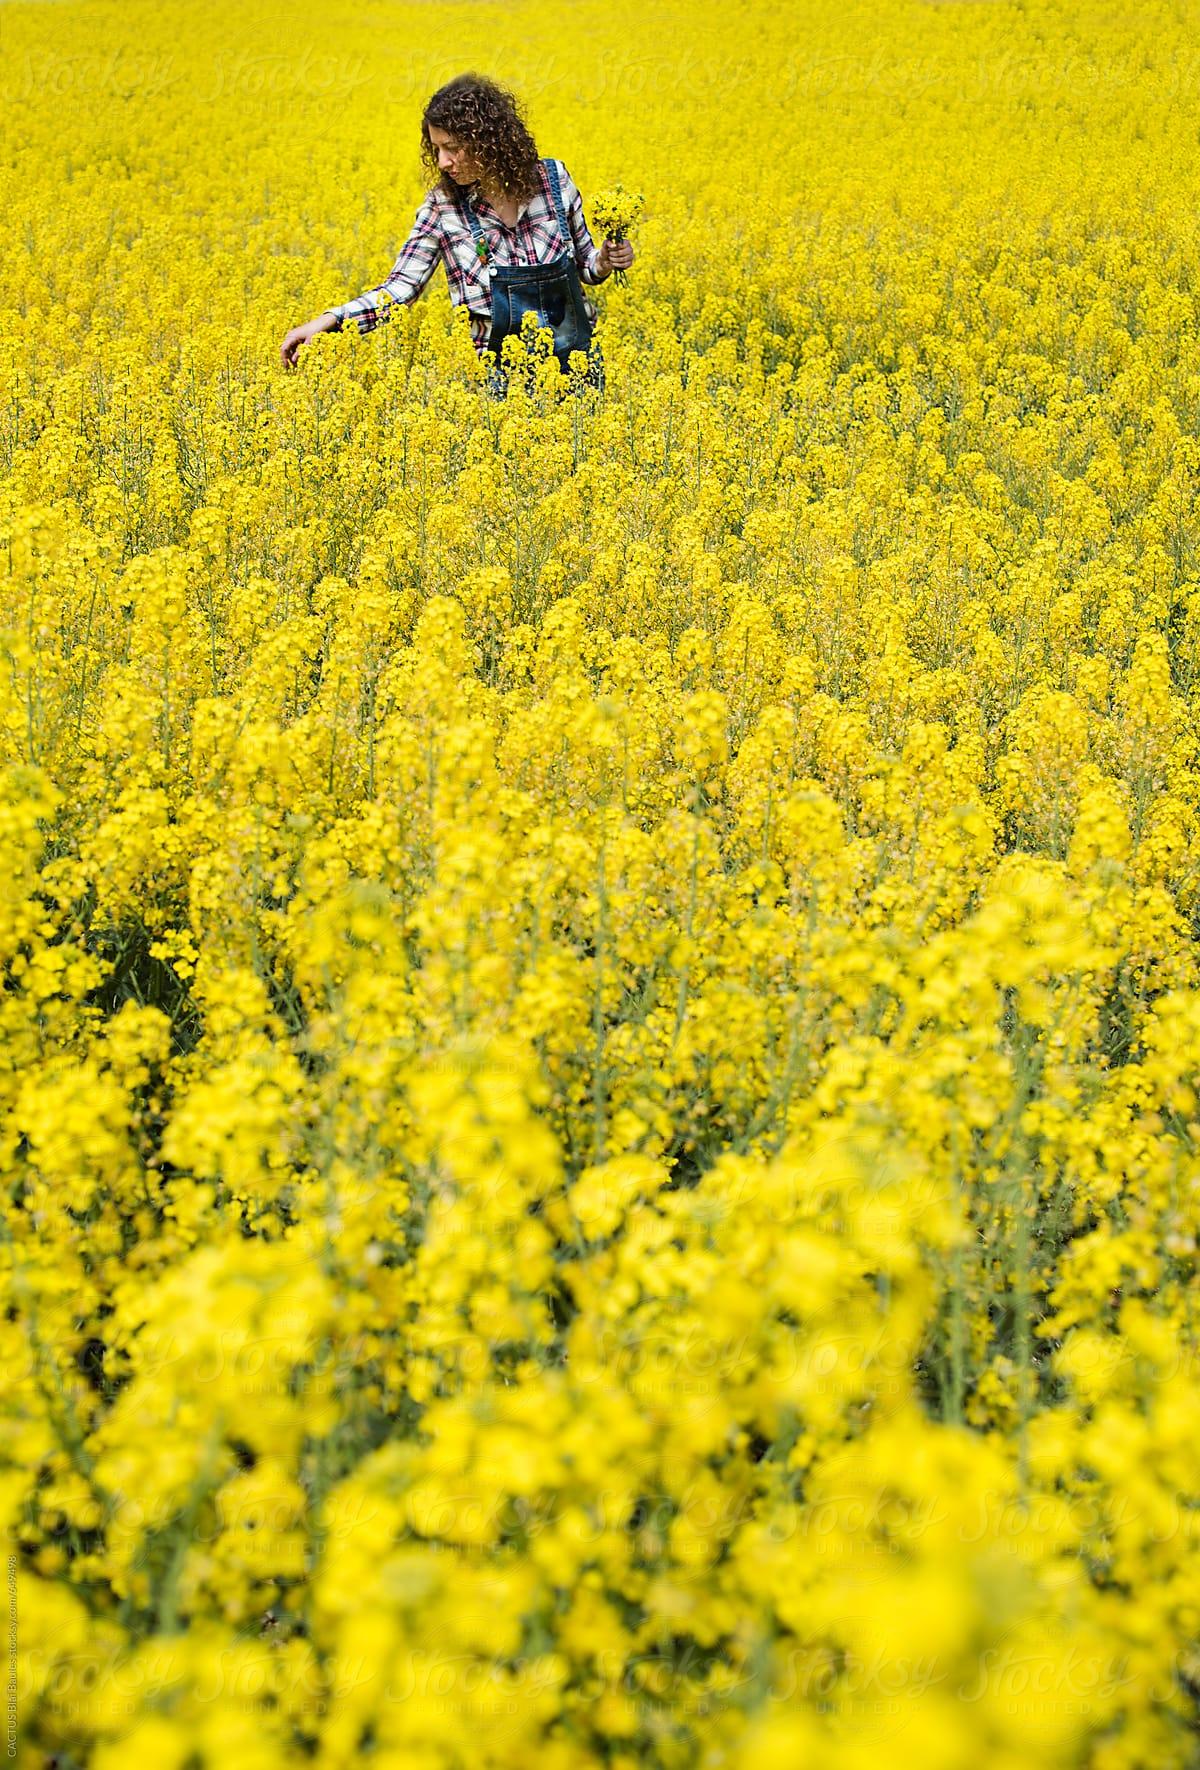 Woman In A Field Of Yellow Flowers Stocksy United